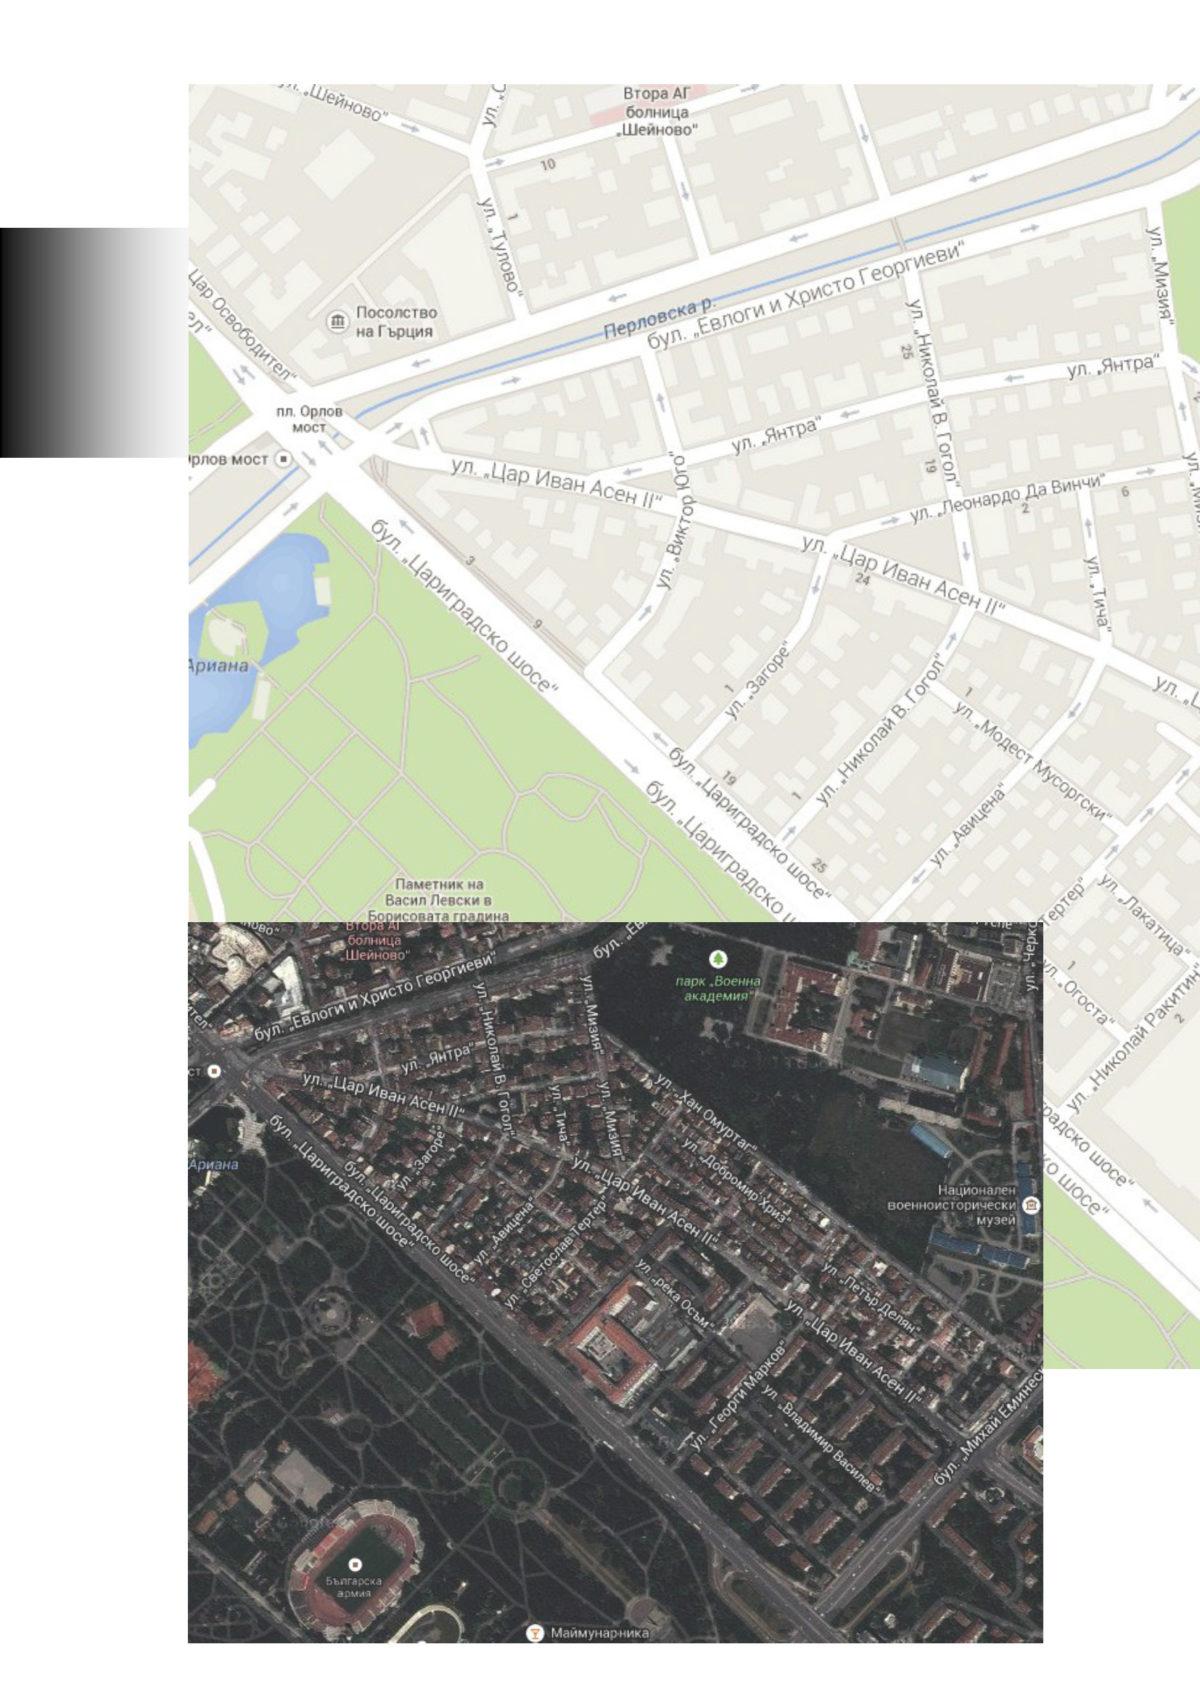 http://www.petkovstudio.com/bg/wp-content/uploads/2011/02/ivanasen_Page_10-1200x1697.jpg